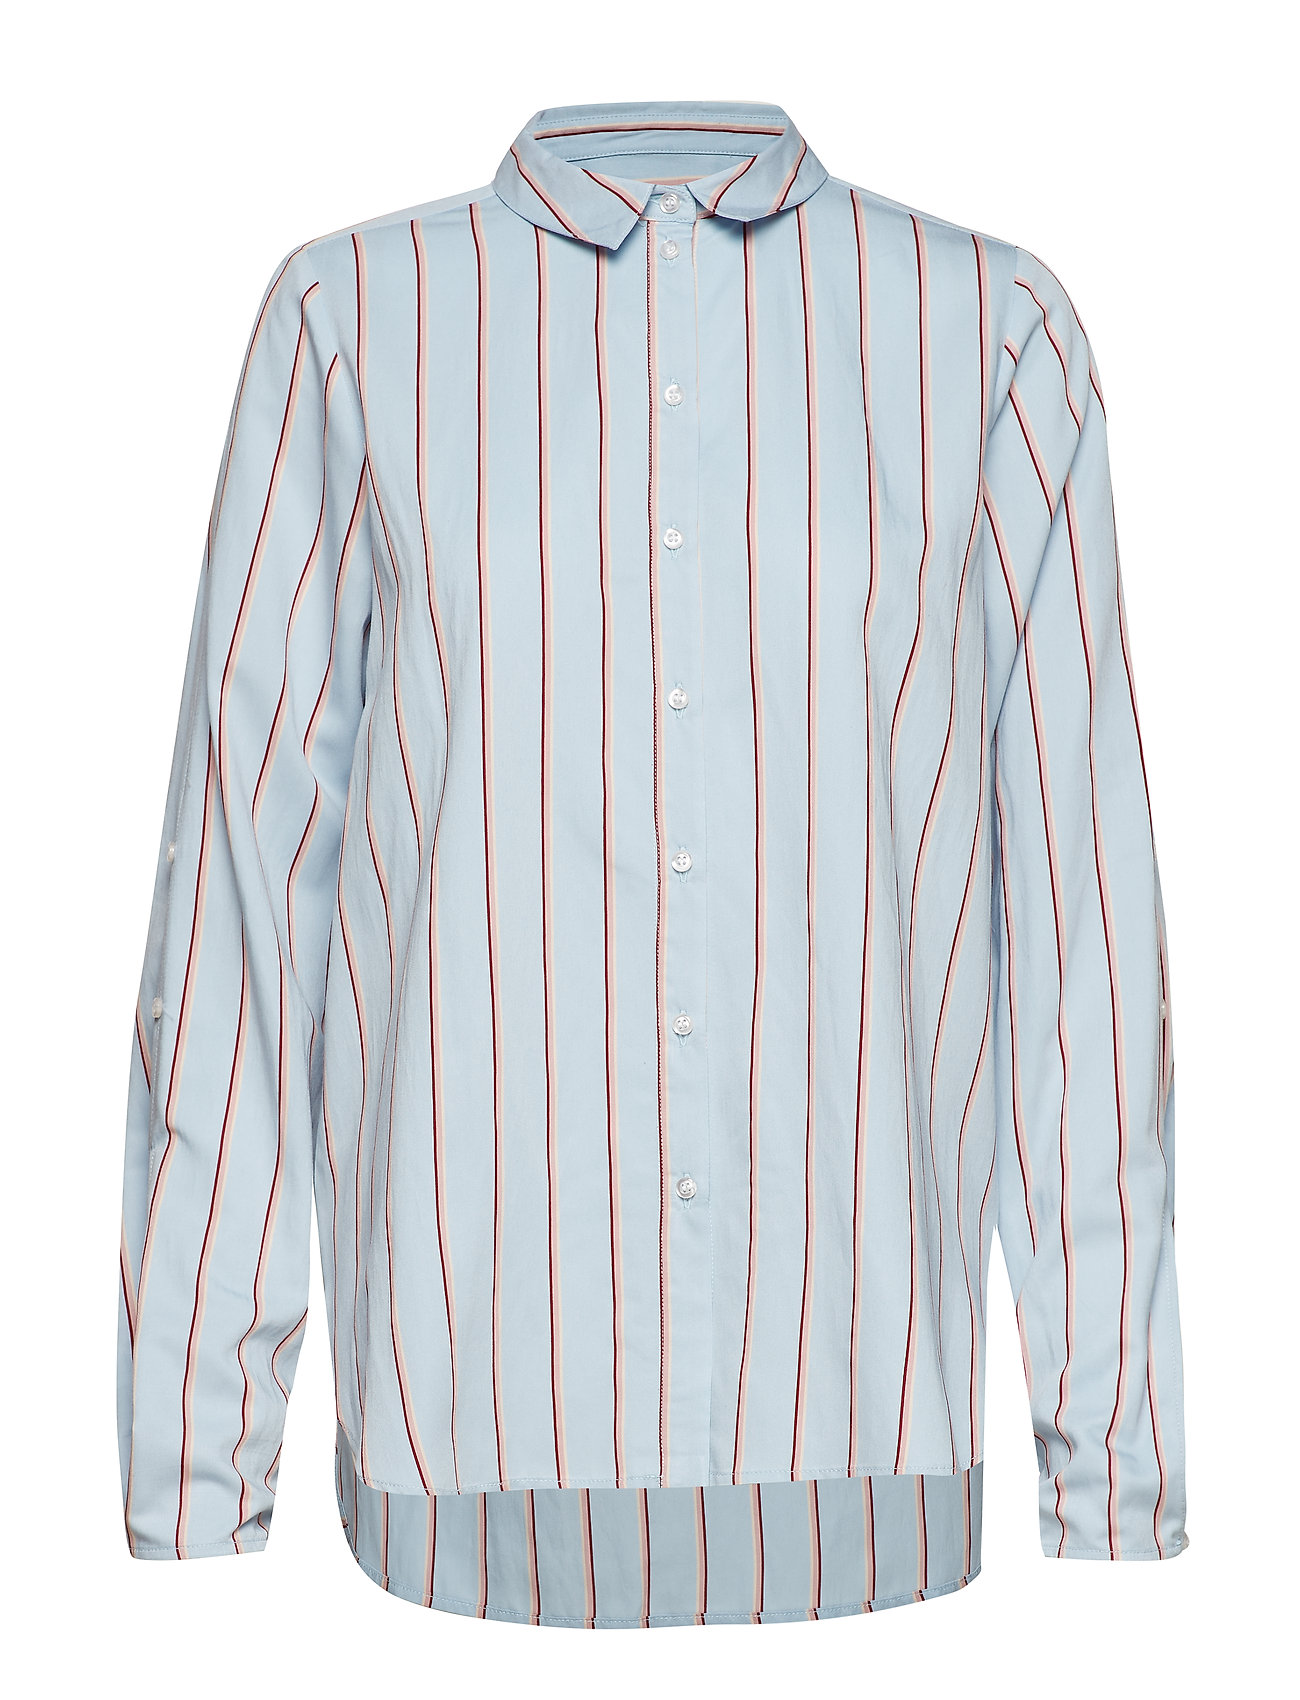 Gestuz Chemise shirt SO19 - LIGHT BLUE WITH STRIPES